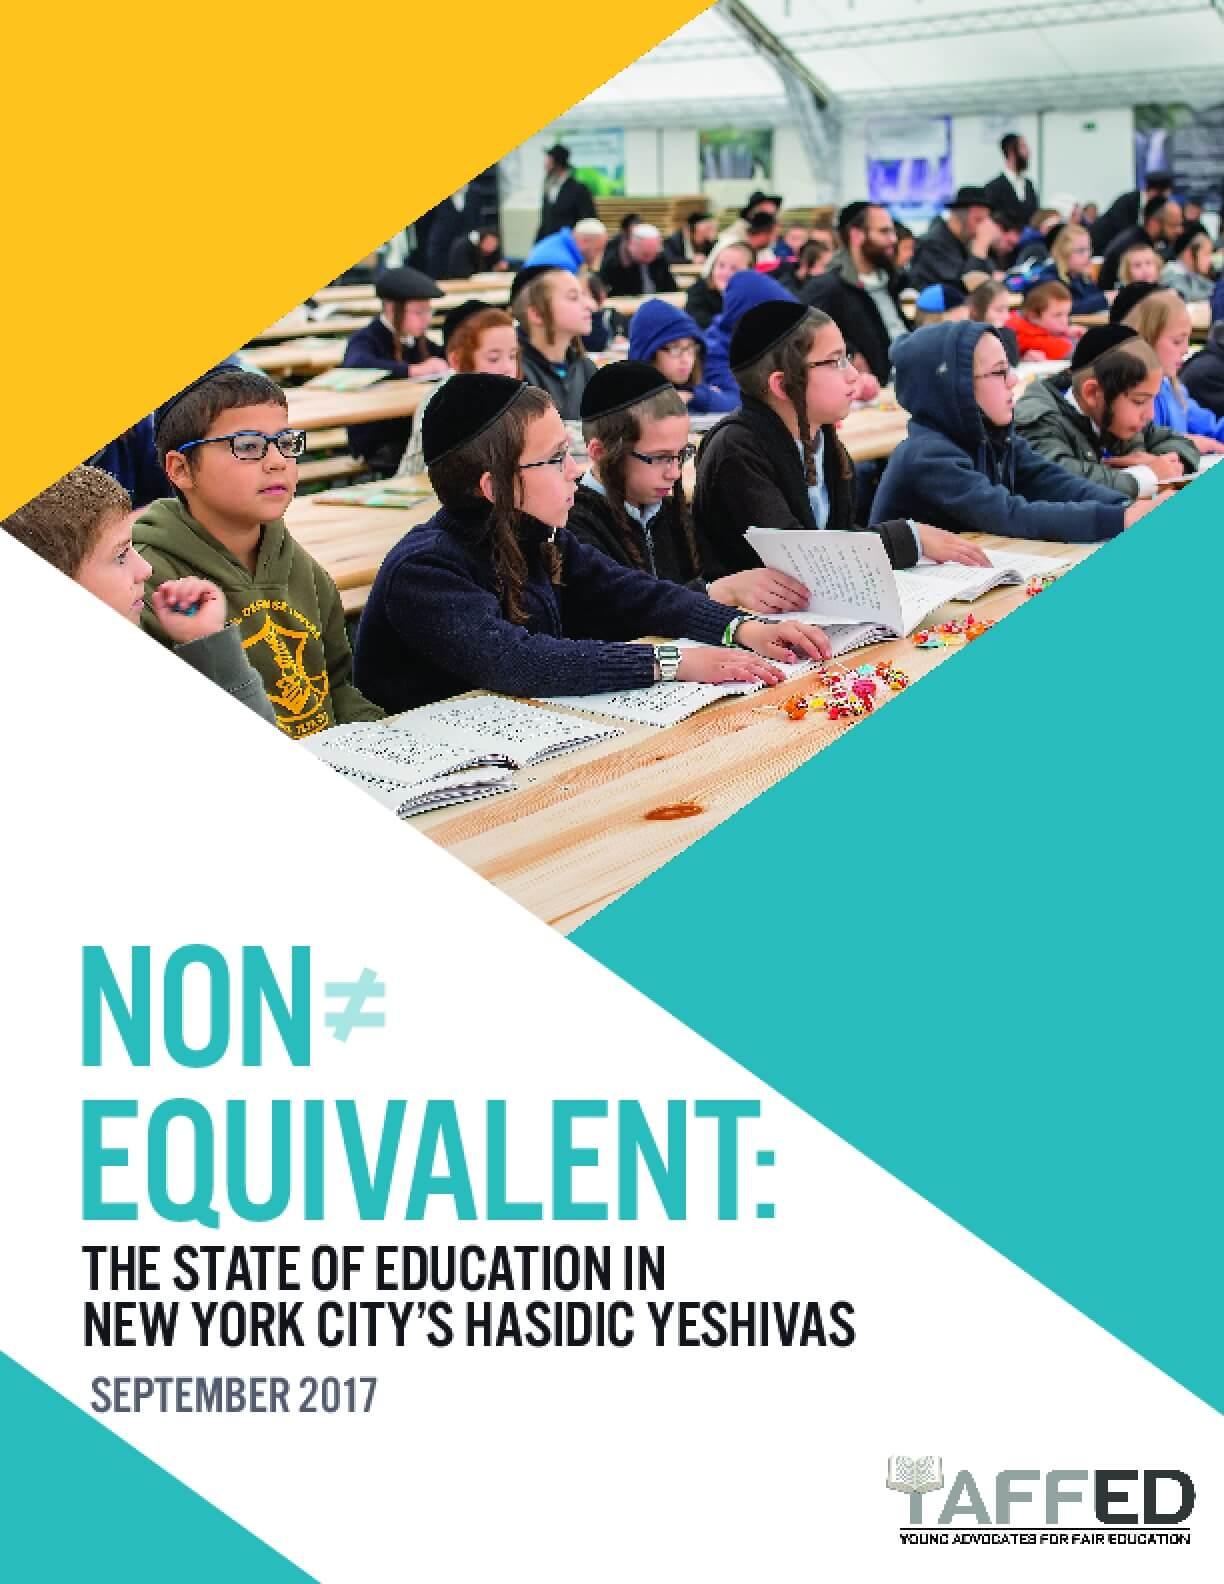 Non Equivalent: The State of Education in New York City's Hasidic Yeshivas